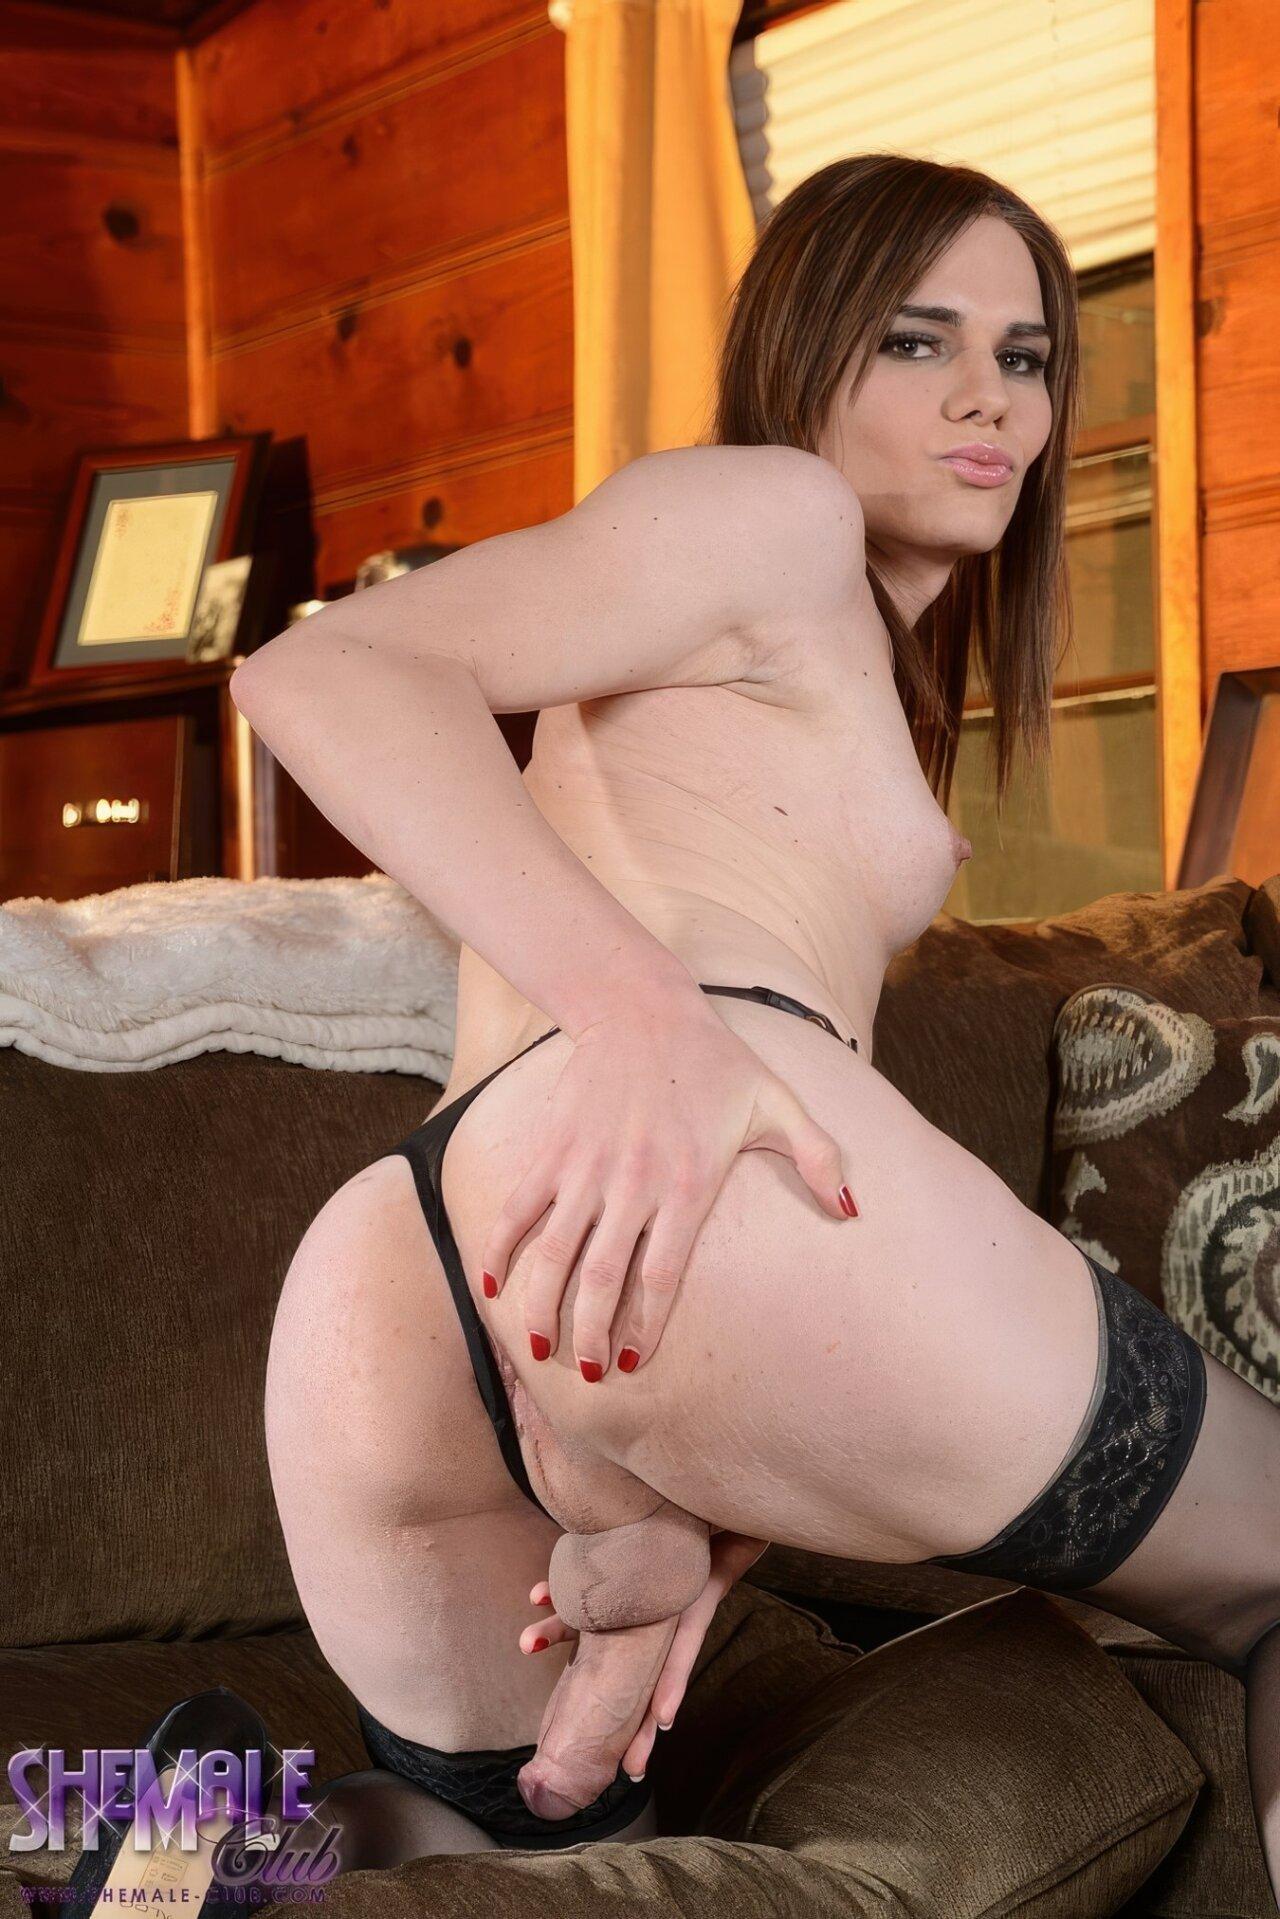 Miranda Meadows Shemale (24)